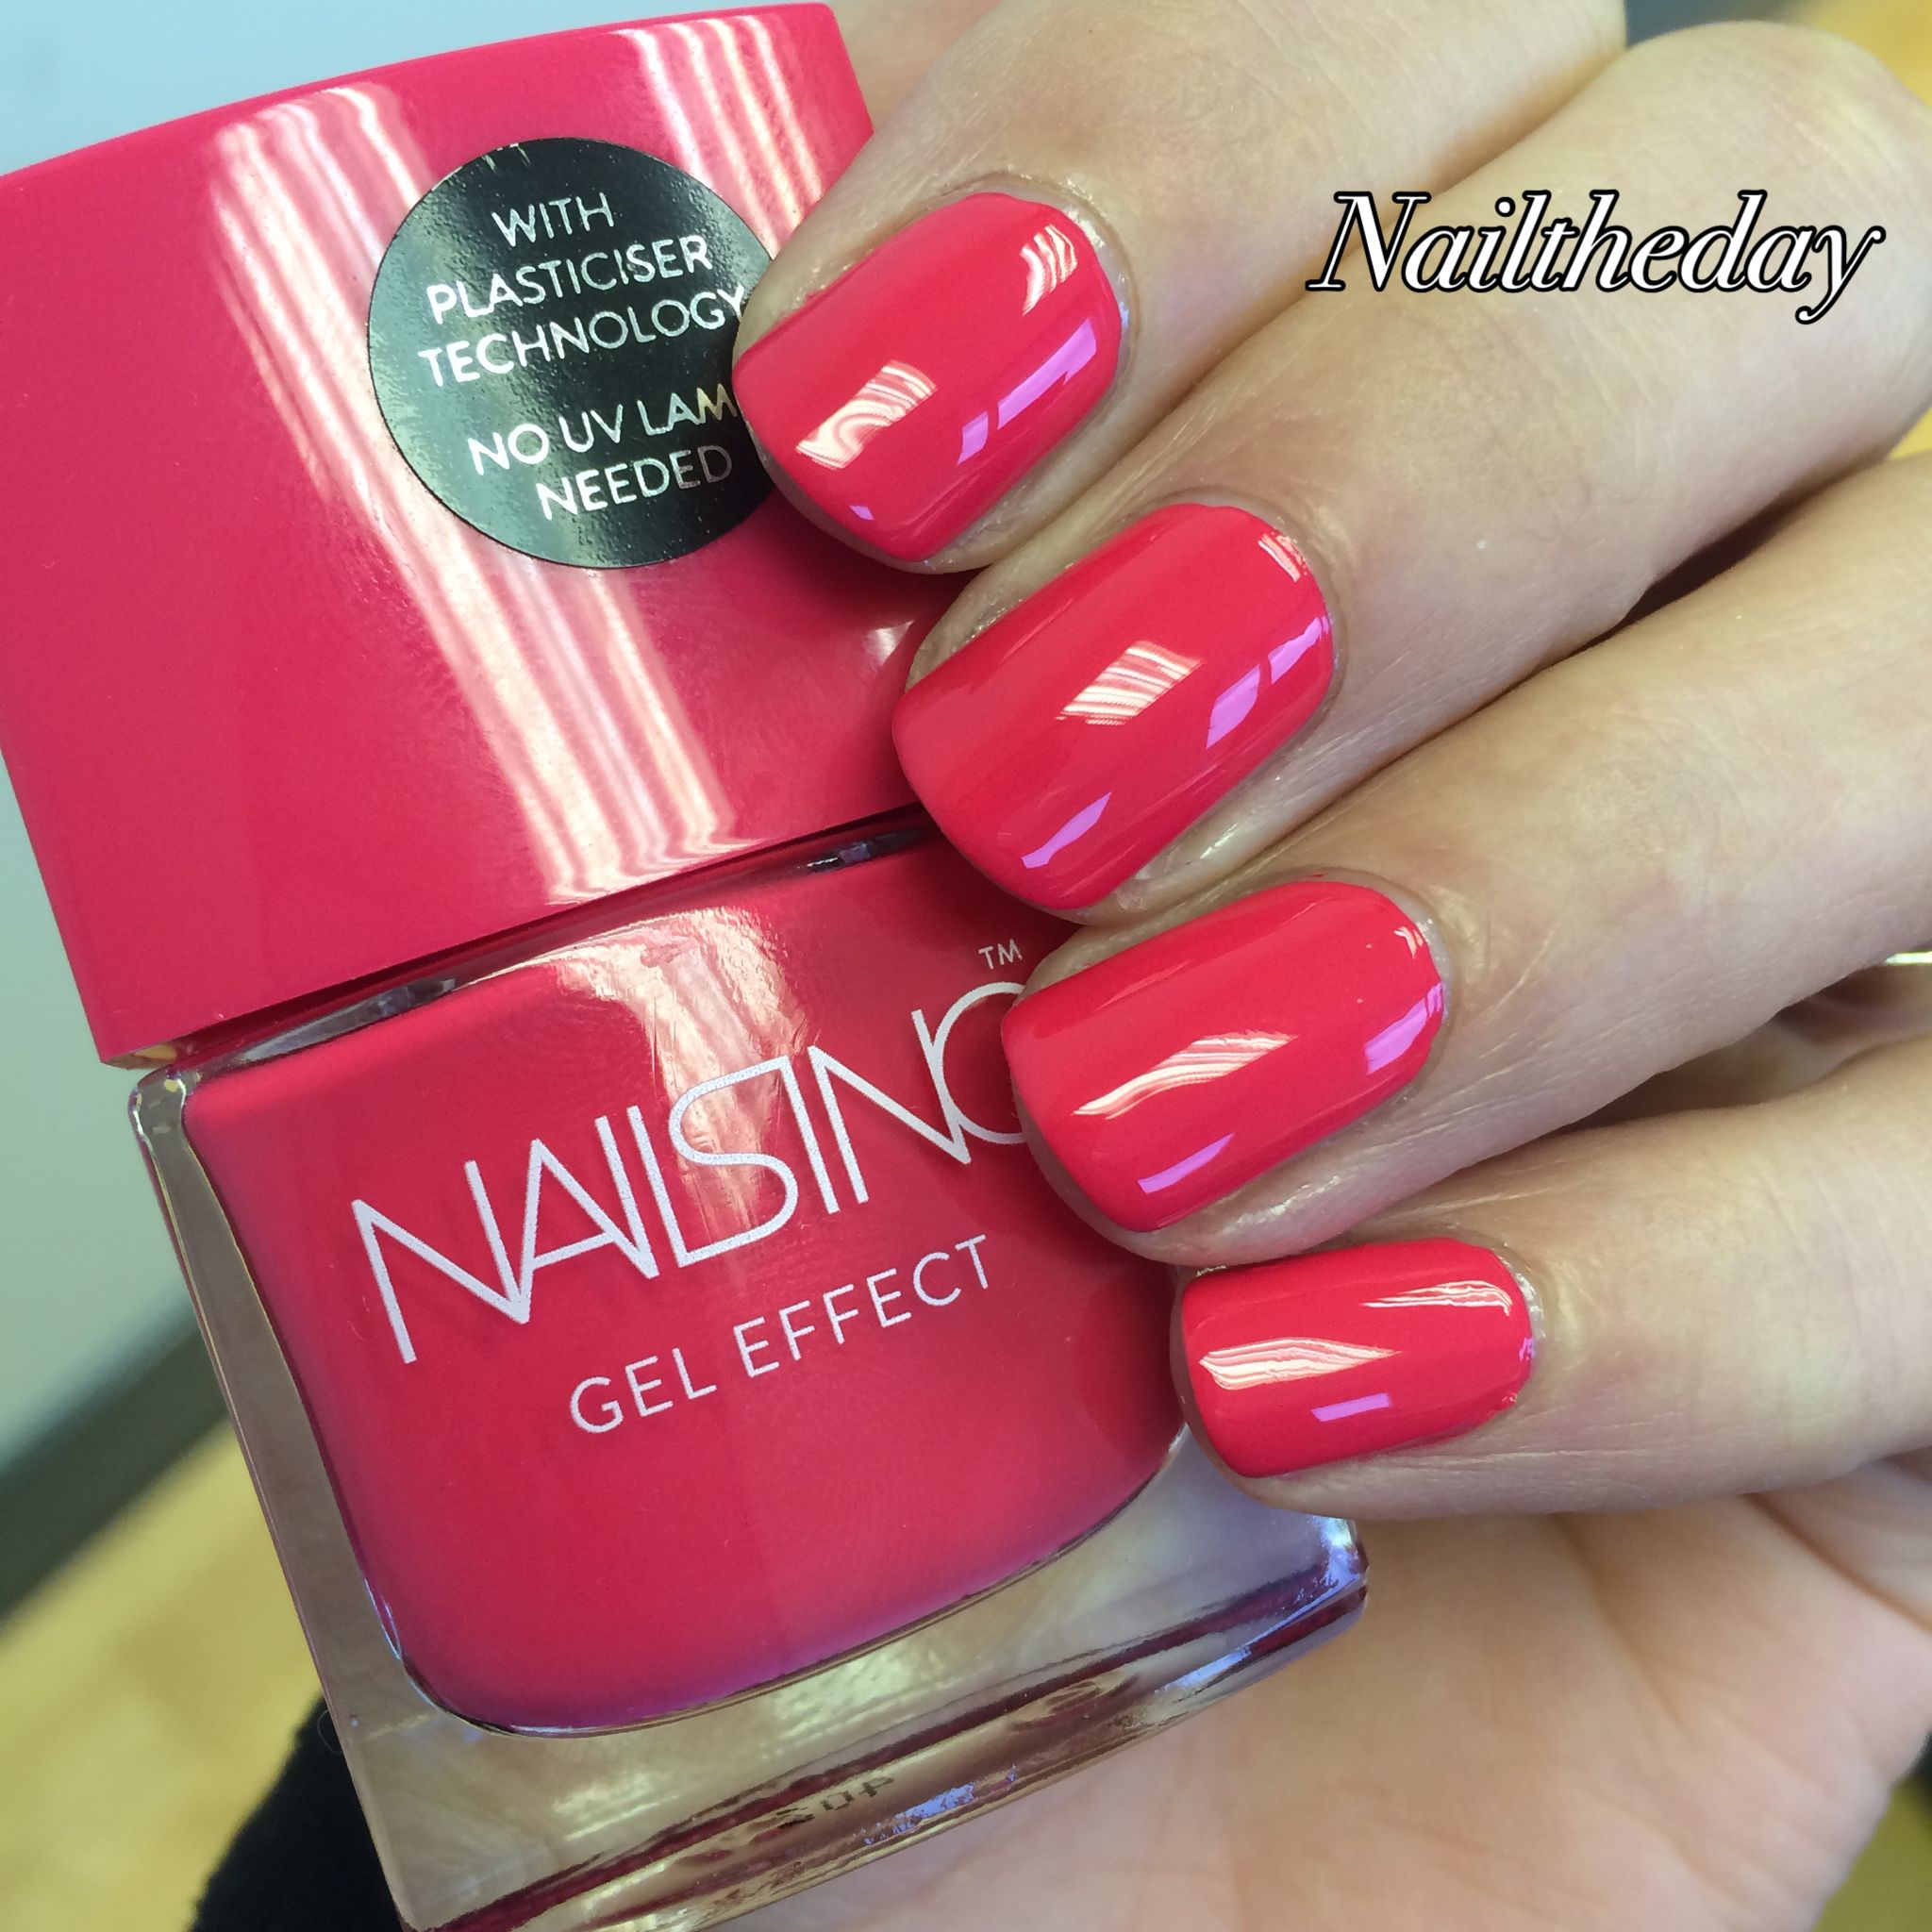 Nails inc gel nail colors and gel nail polish on pinterest - Manicure Nails Inc